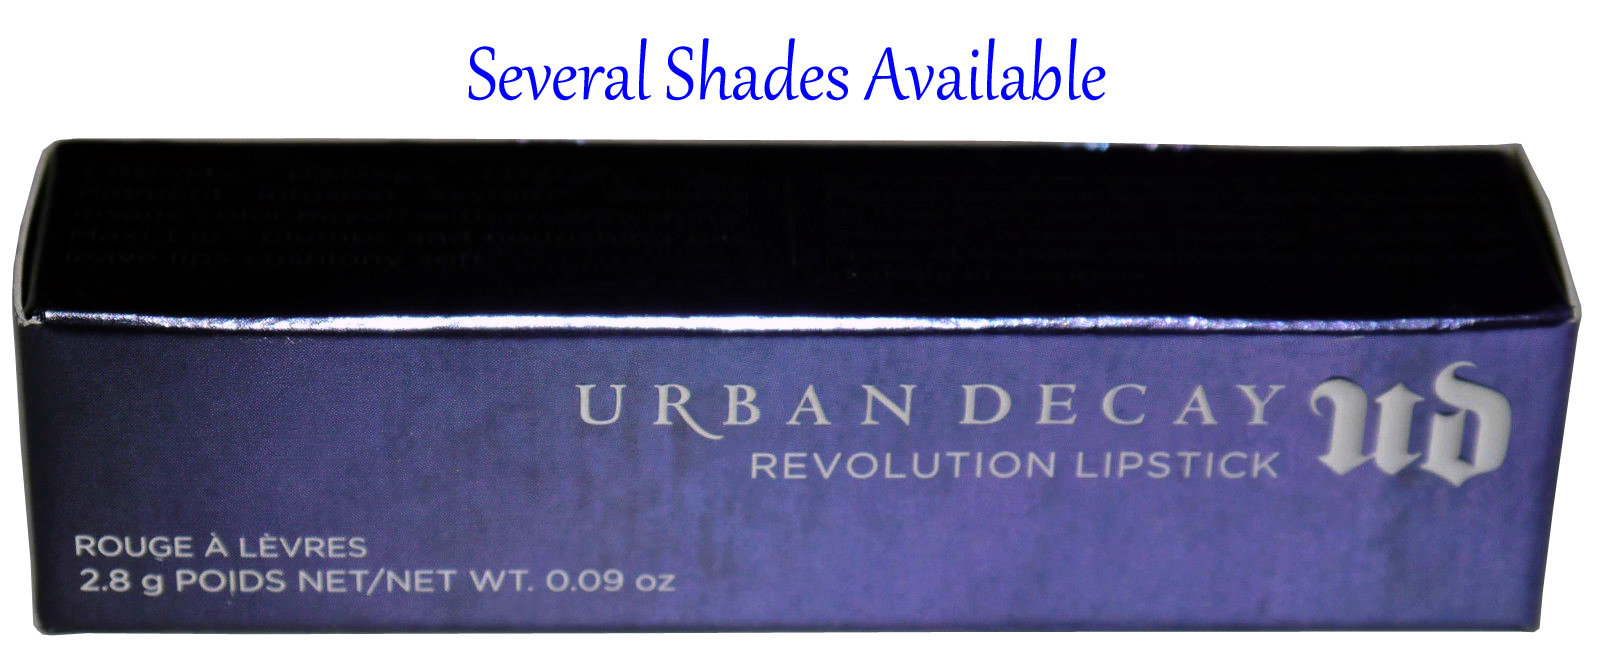 Urban Decay Revolution Lipstick 0.09 oz (Several Shades) 14585